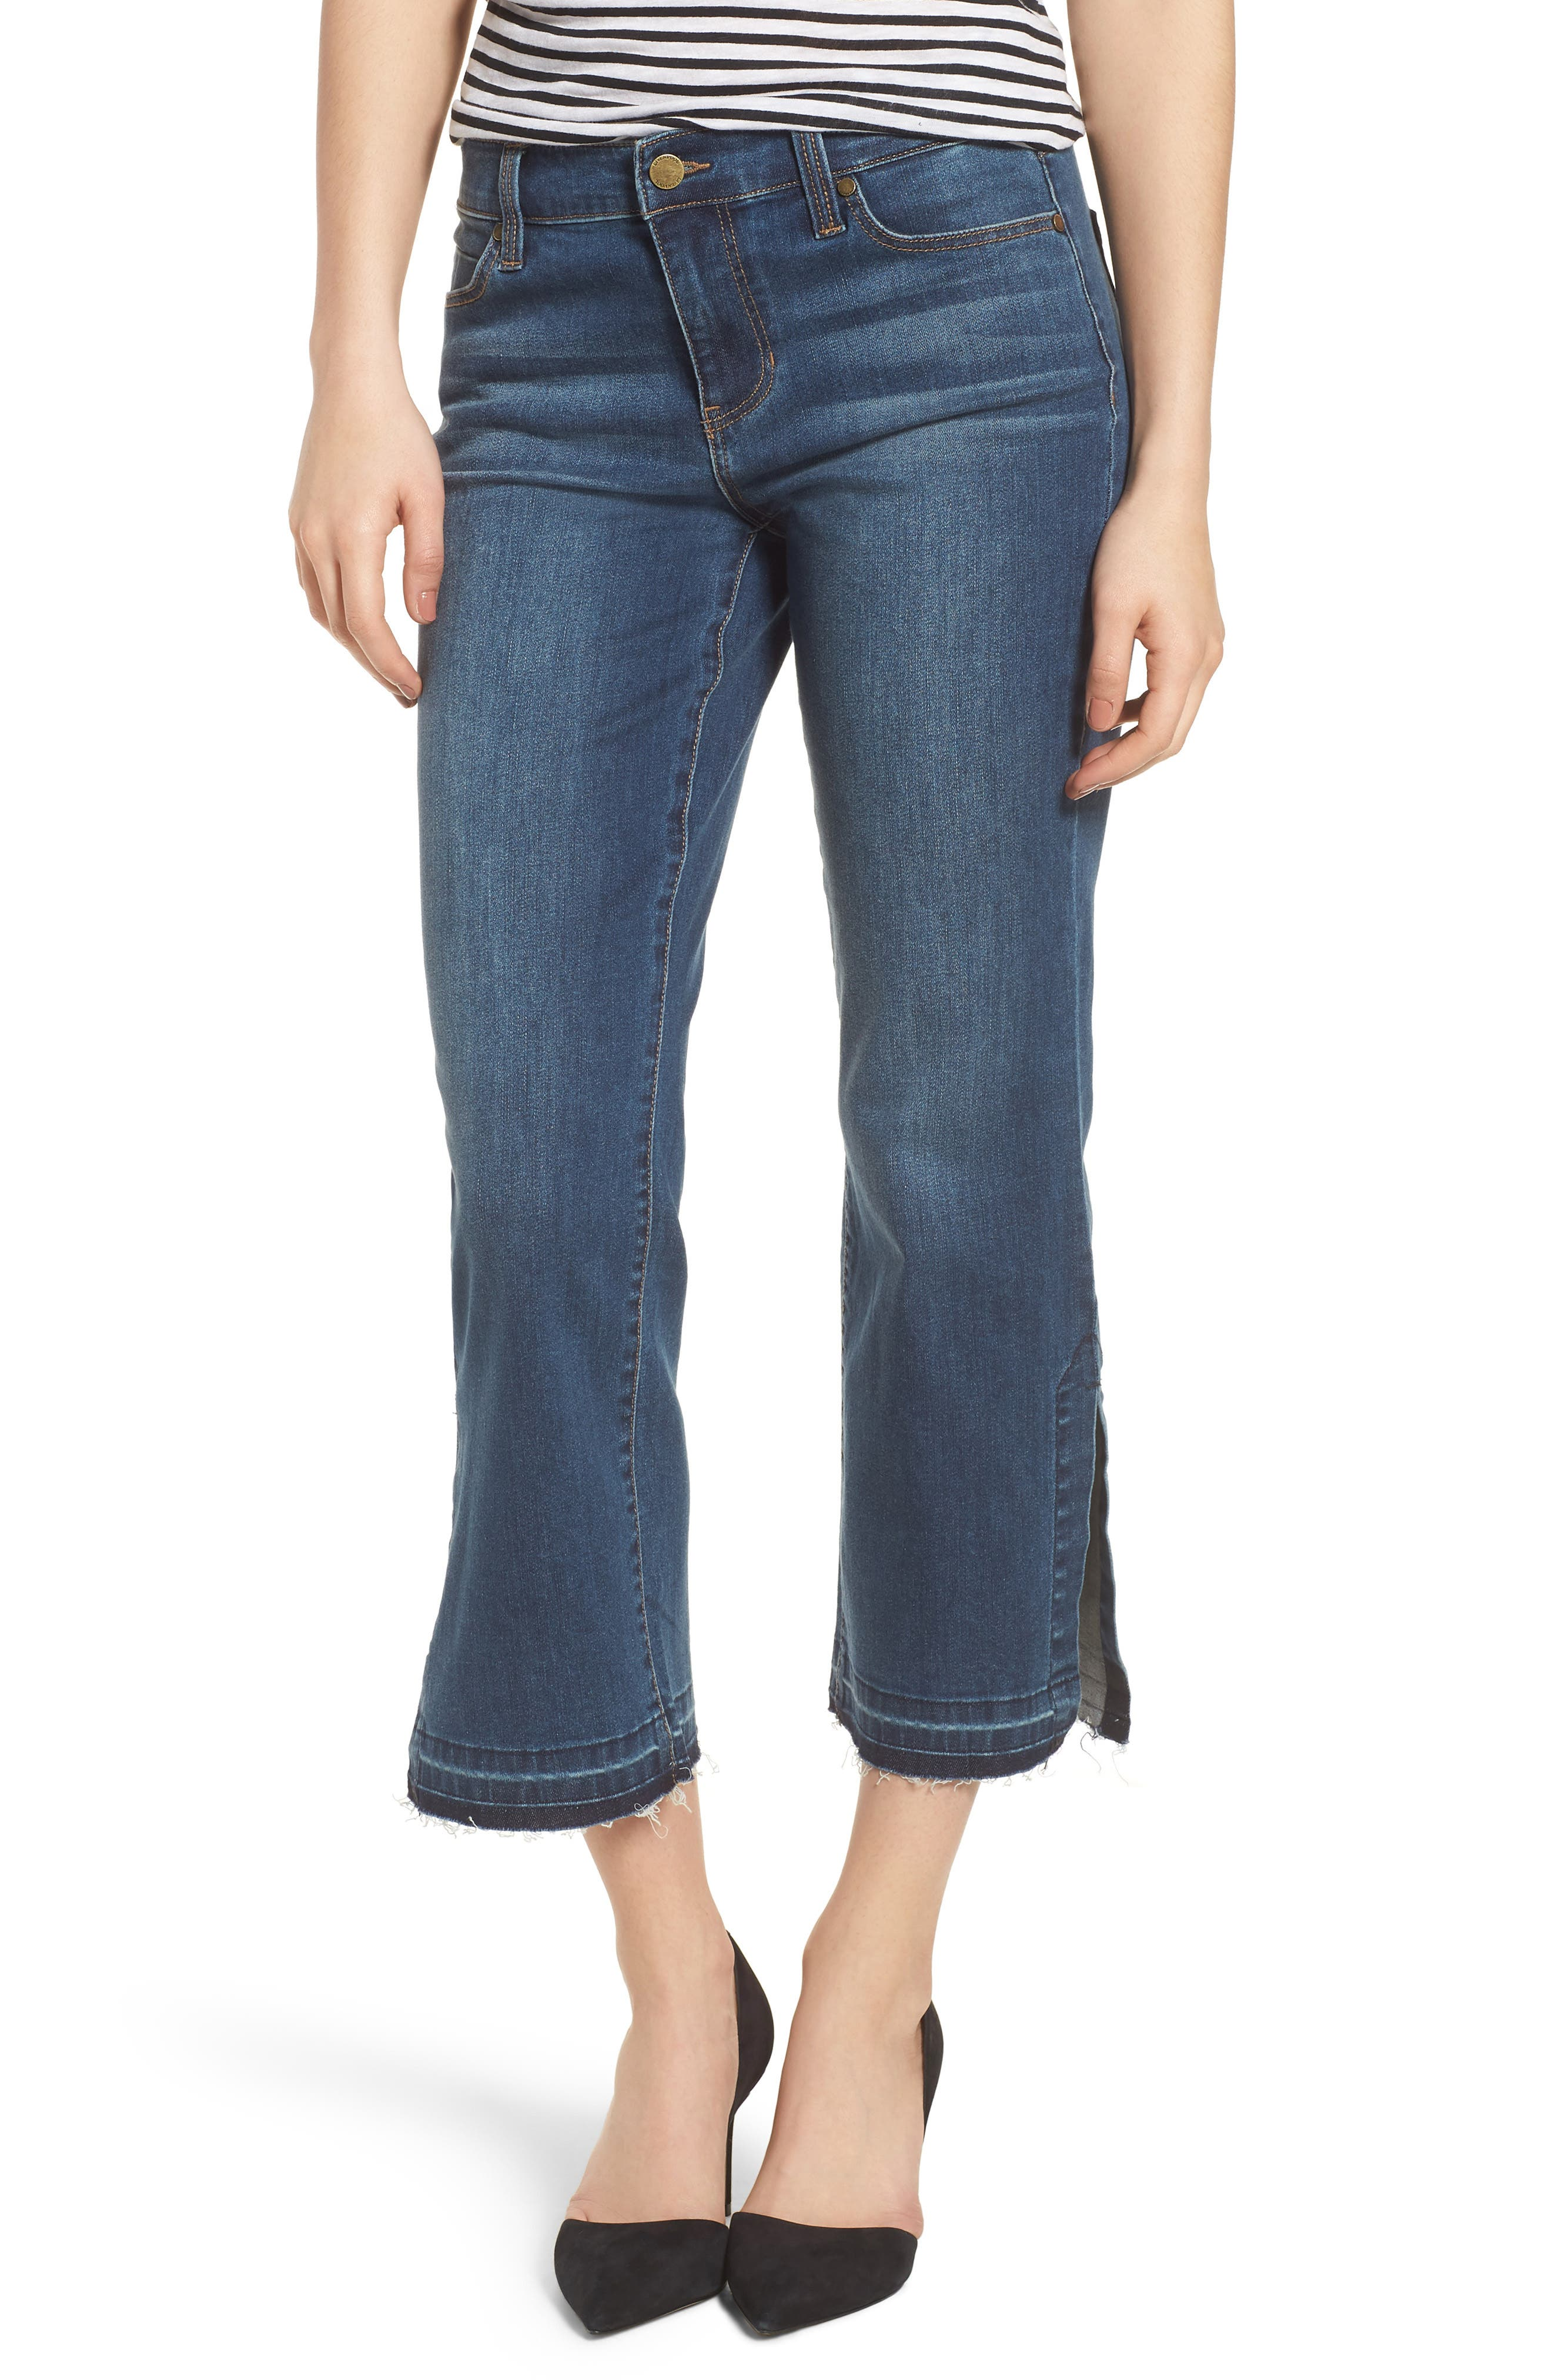 Tabitha Release Hem Crop Jeans,                         Main,                         color, Montauk Mid Blue